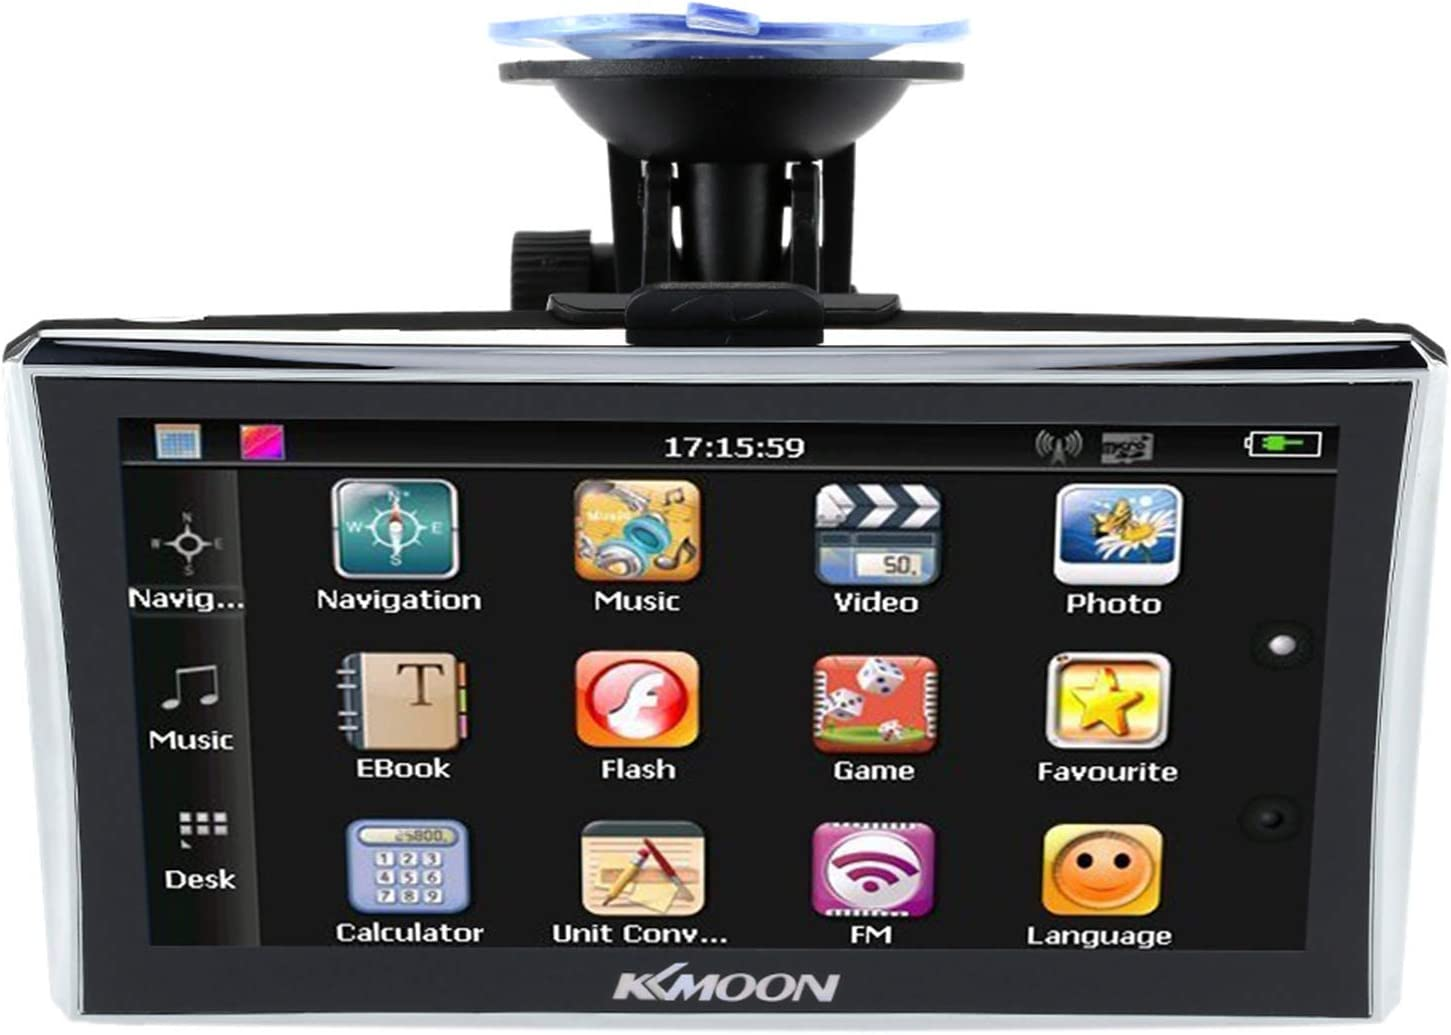 KKmoon Navegador GPS para Coches, GPS Coches 7 Pulgadas HD Pantalla Tactil 128MB RAM 4GB ROM FM MP3 Video Reproductor con Mapa